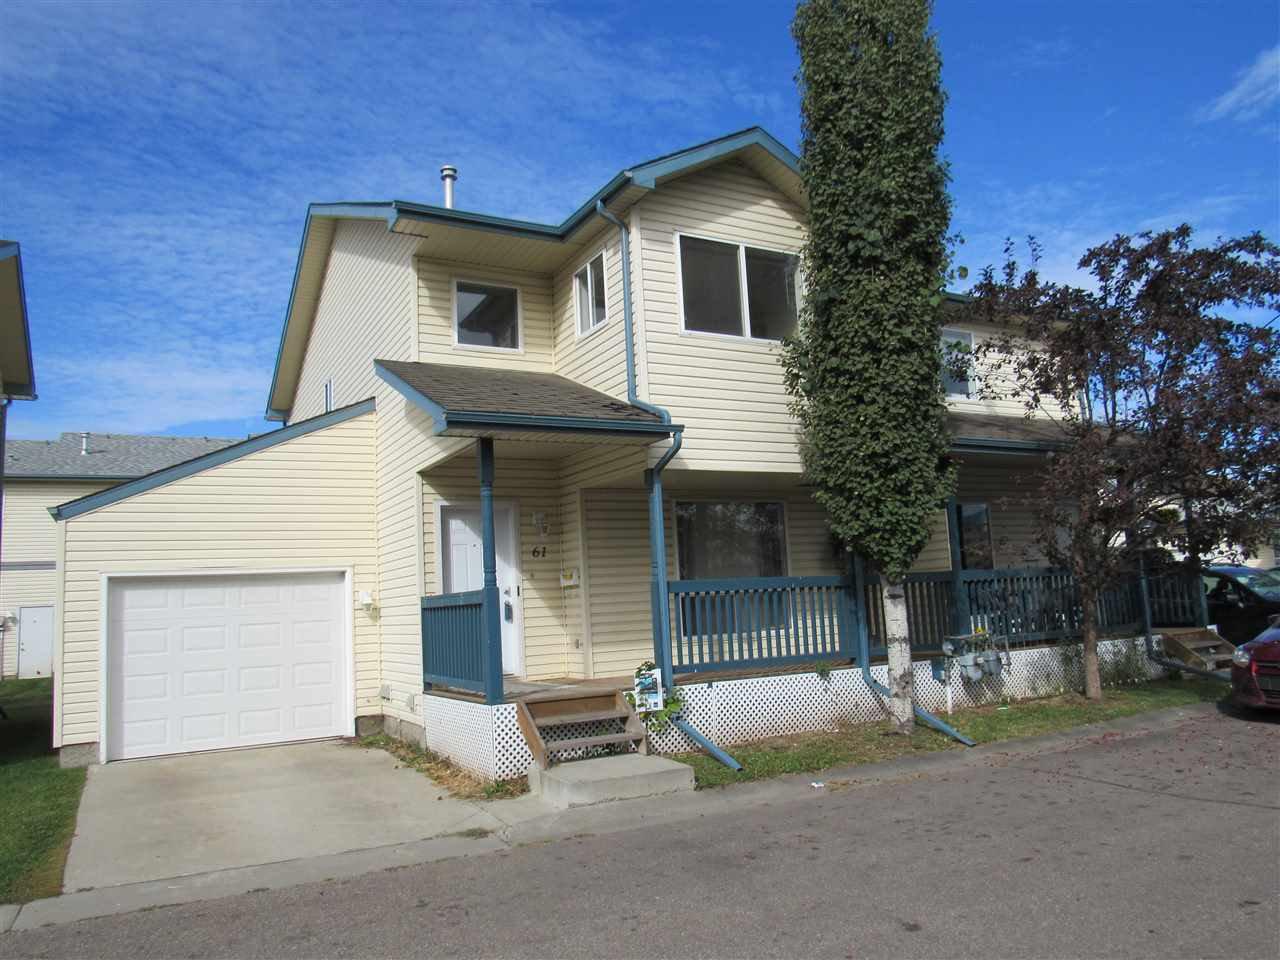 Main Photo: 61 10909 106 Street in Edmonton: Zone 08 House Half Duplex for sale : MLS®# E4212244